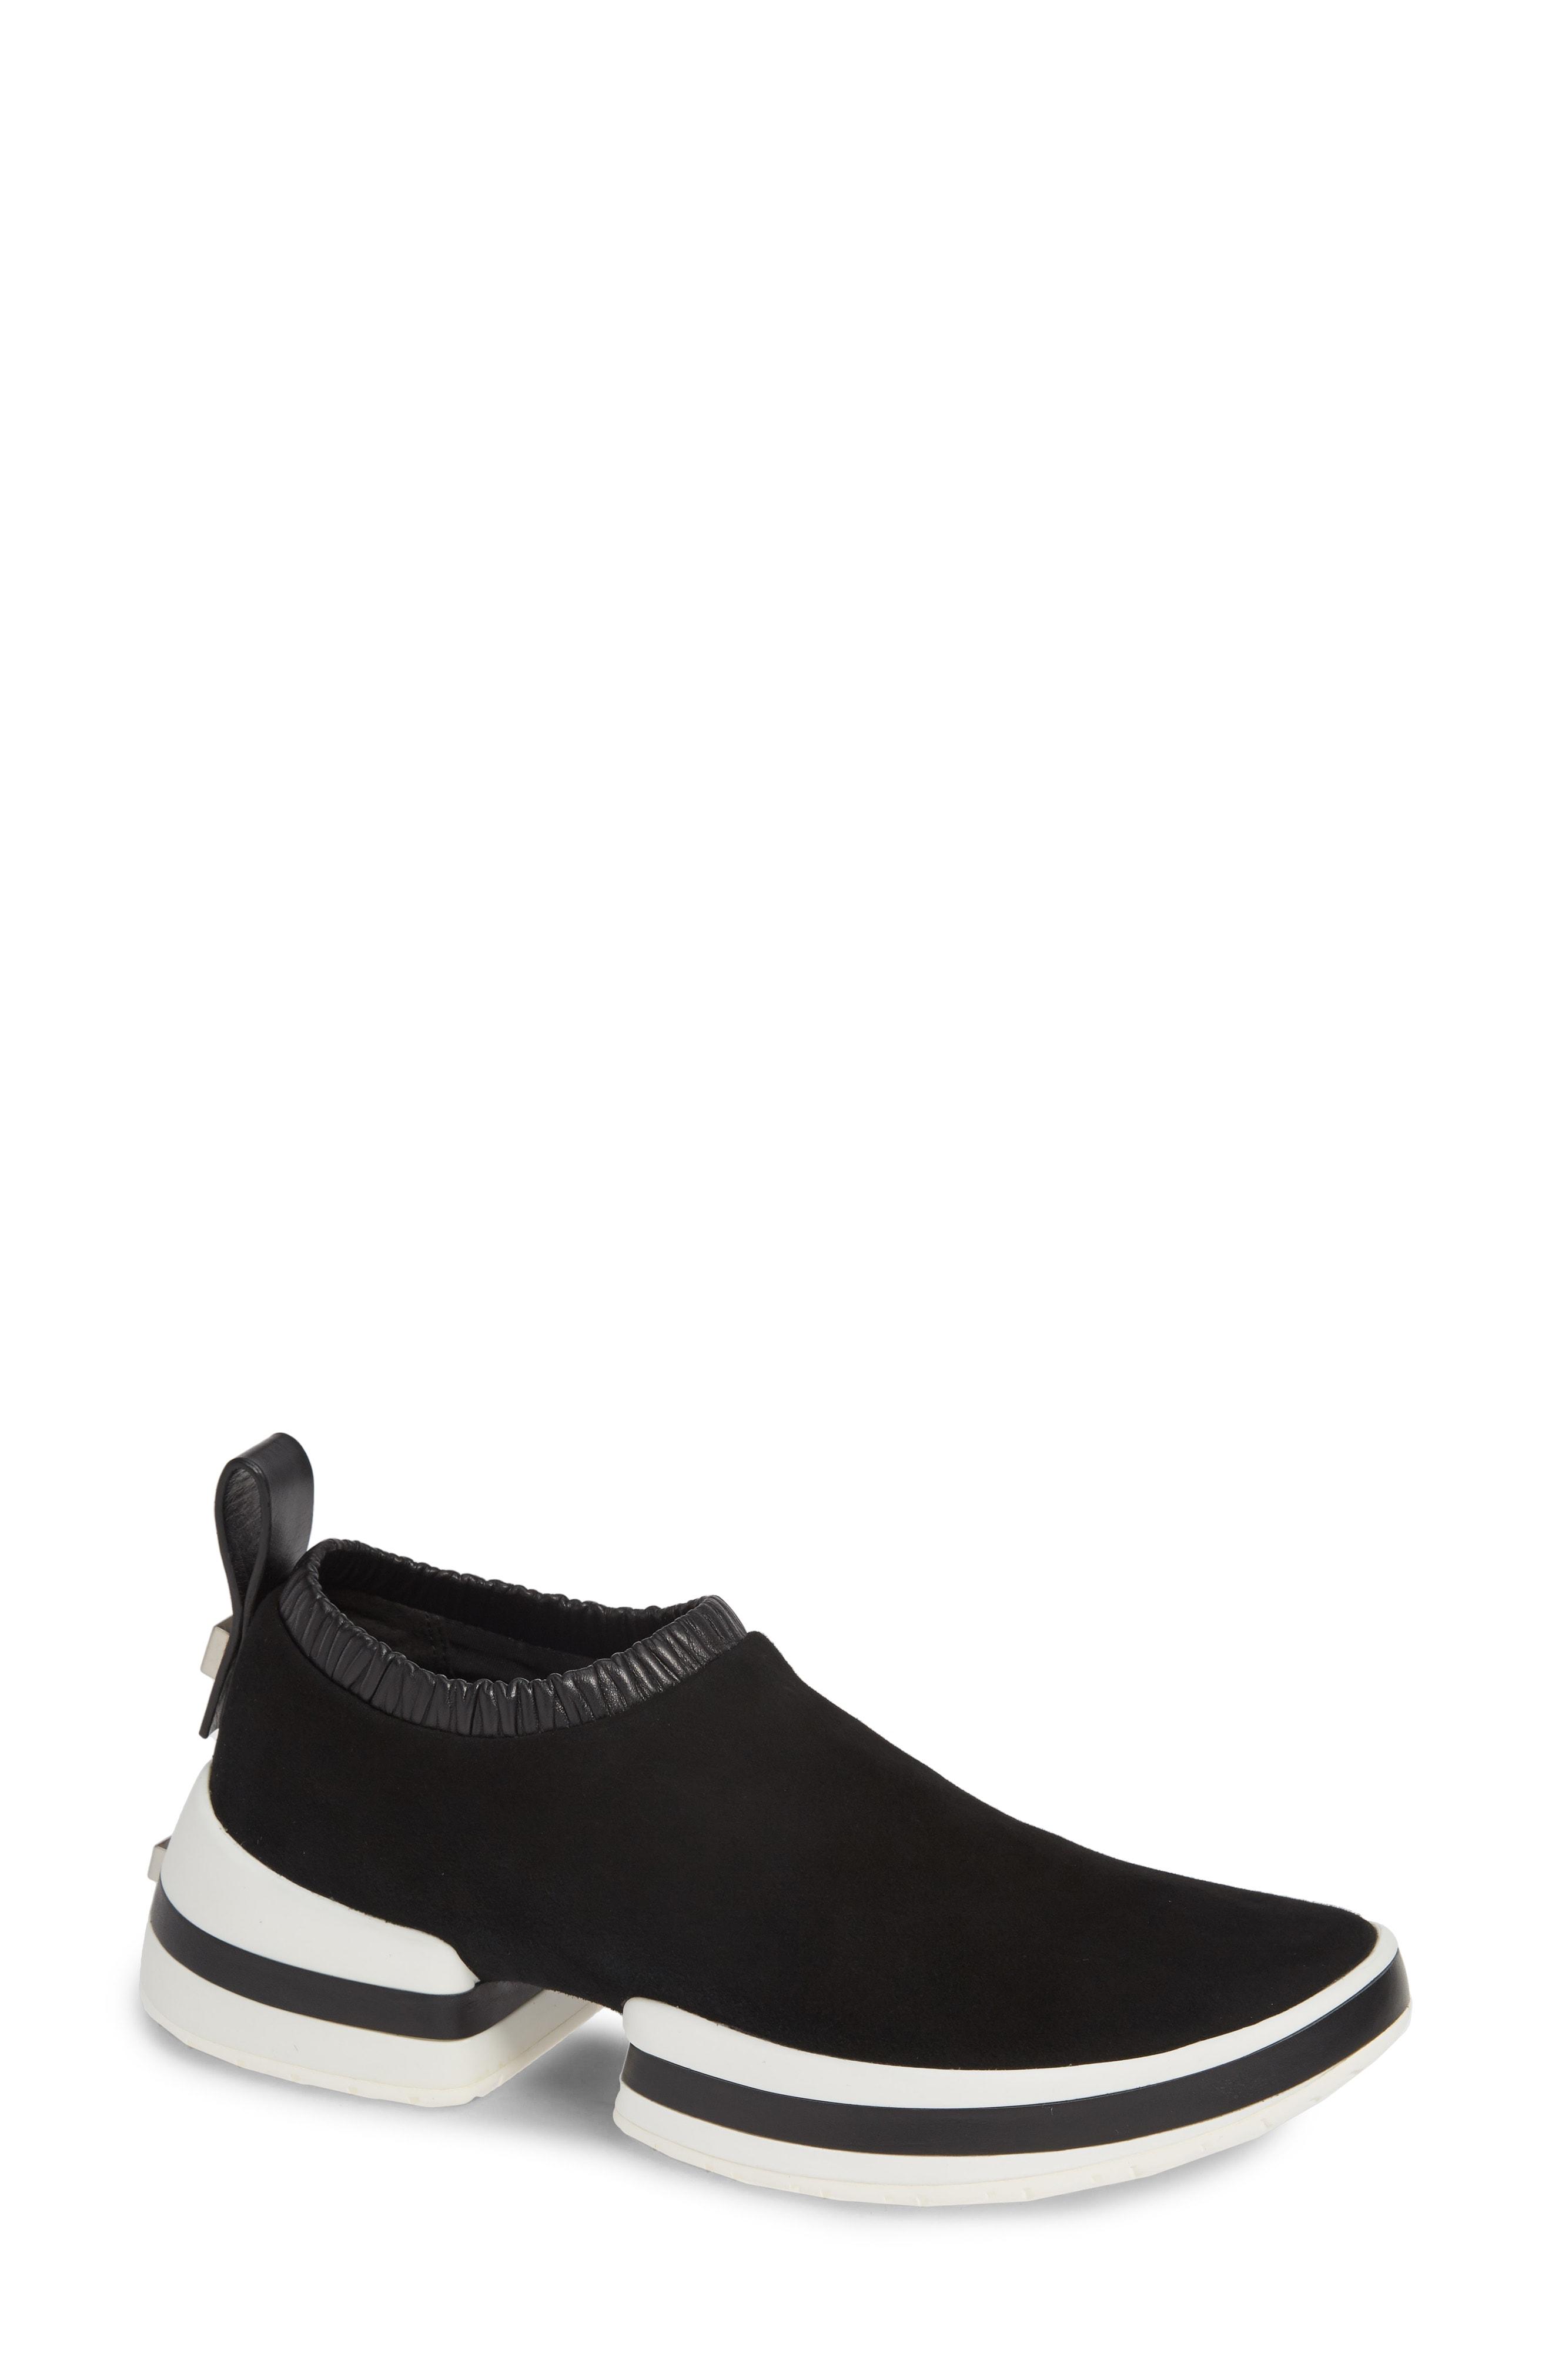 Stuart Weitzman 612 Sneaker (Women)